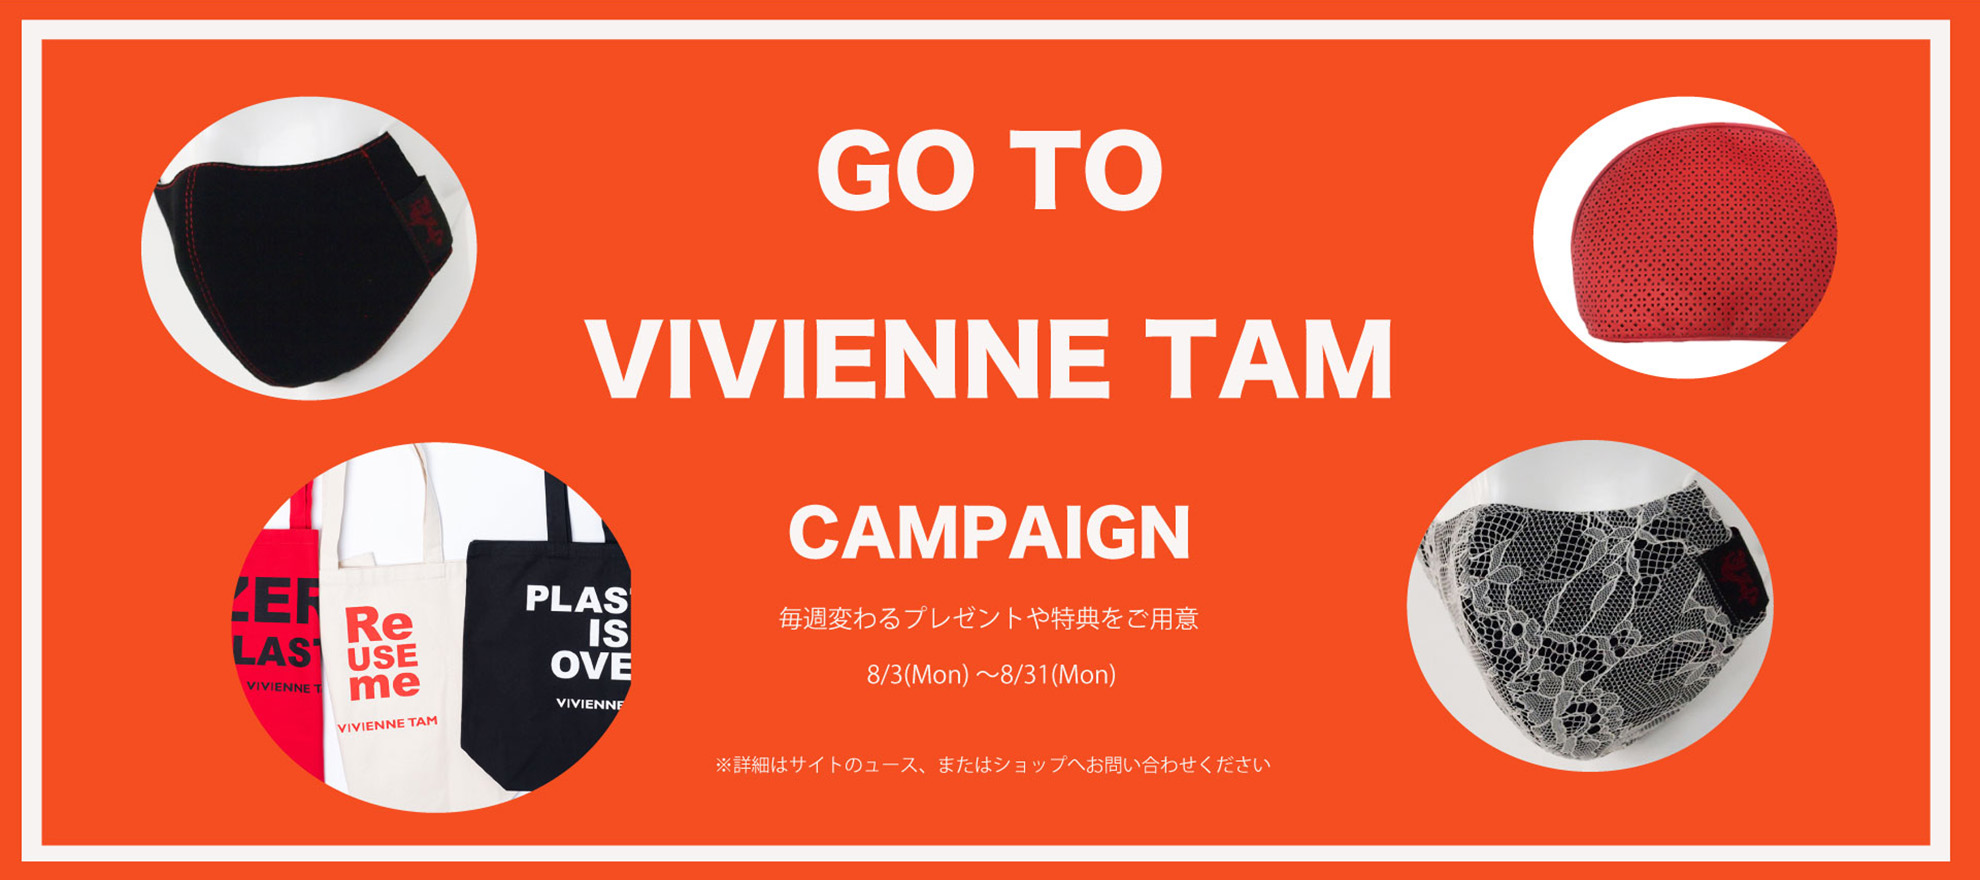 GO TO VIVIENNE TAM CAMPAIGN